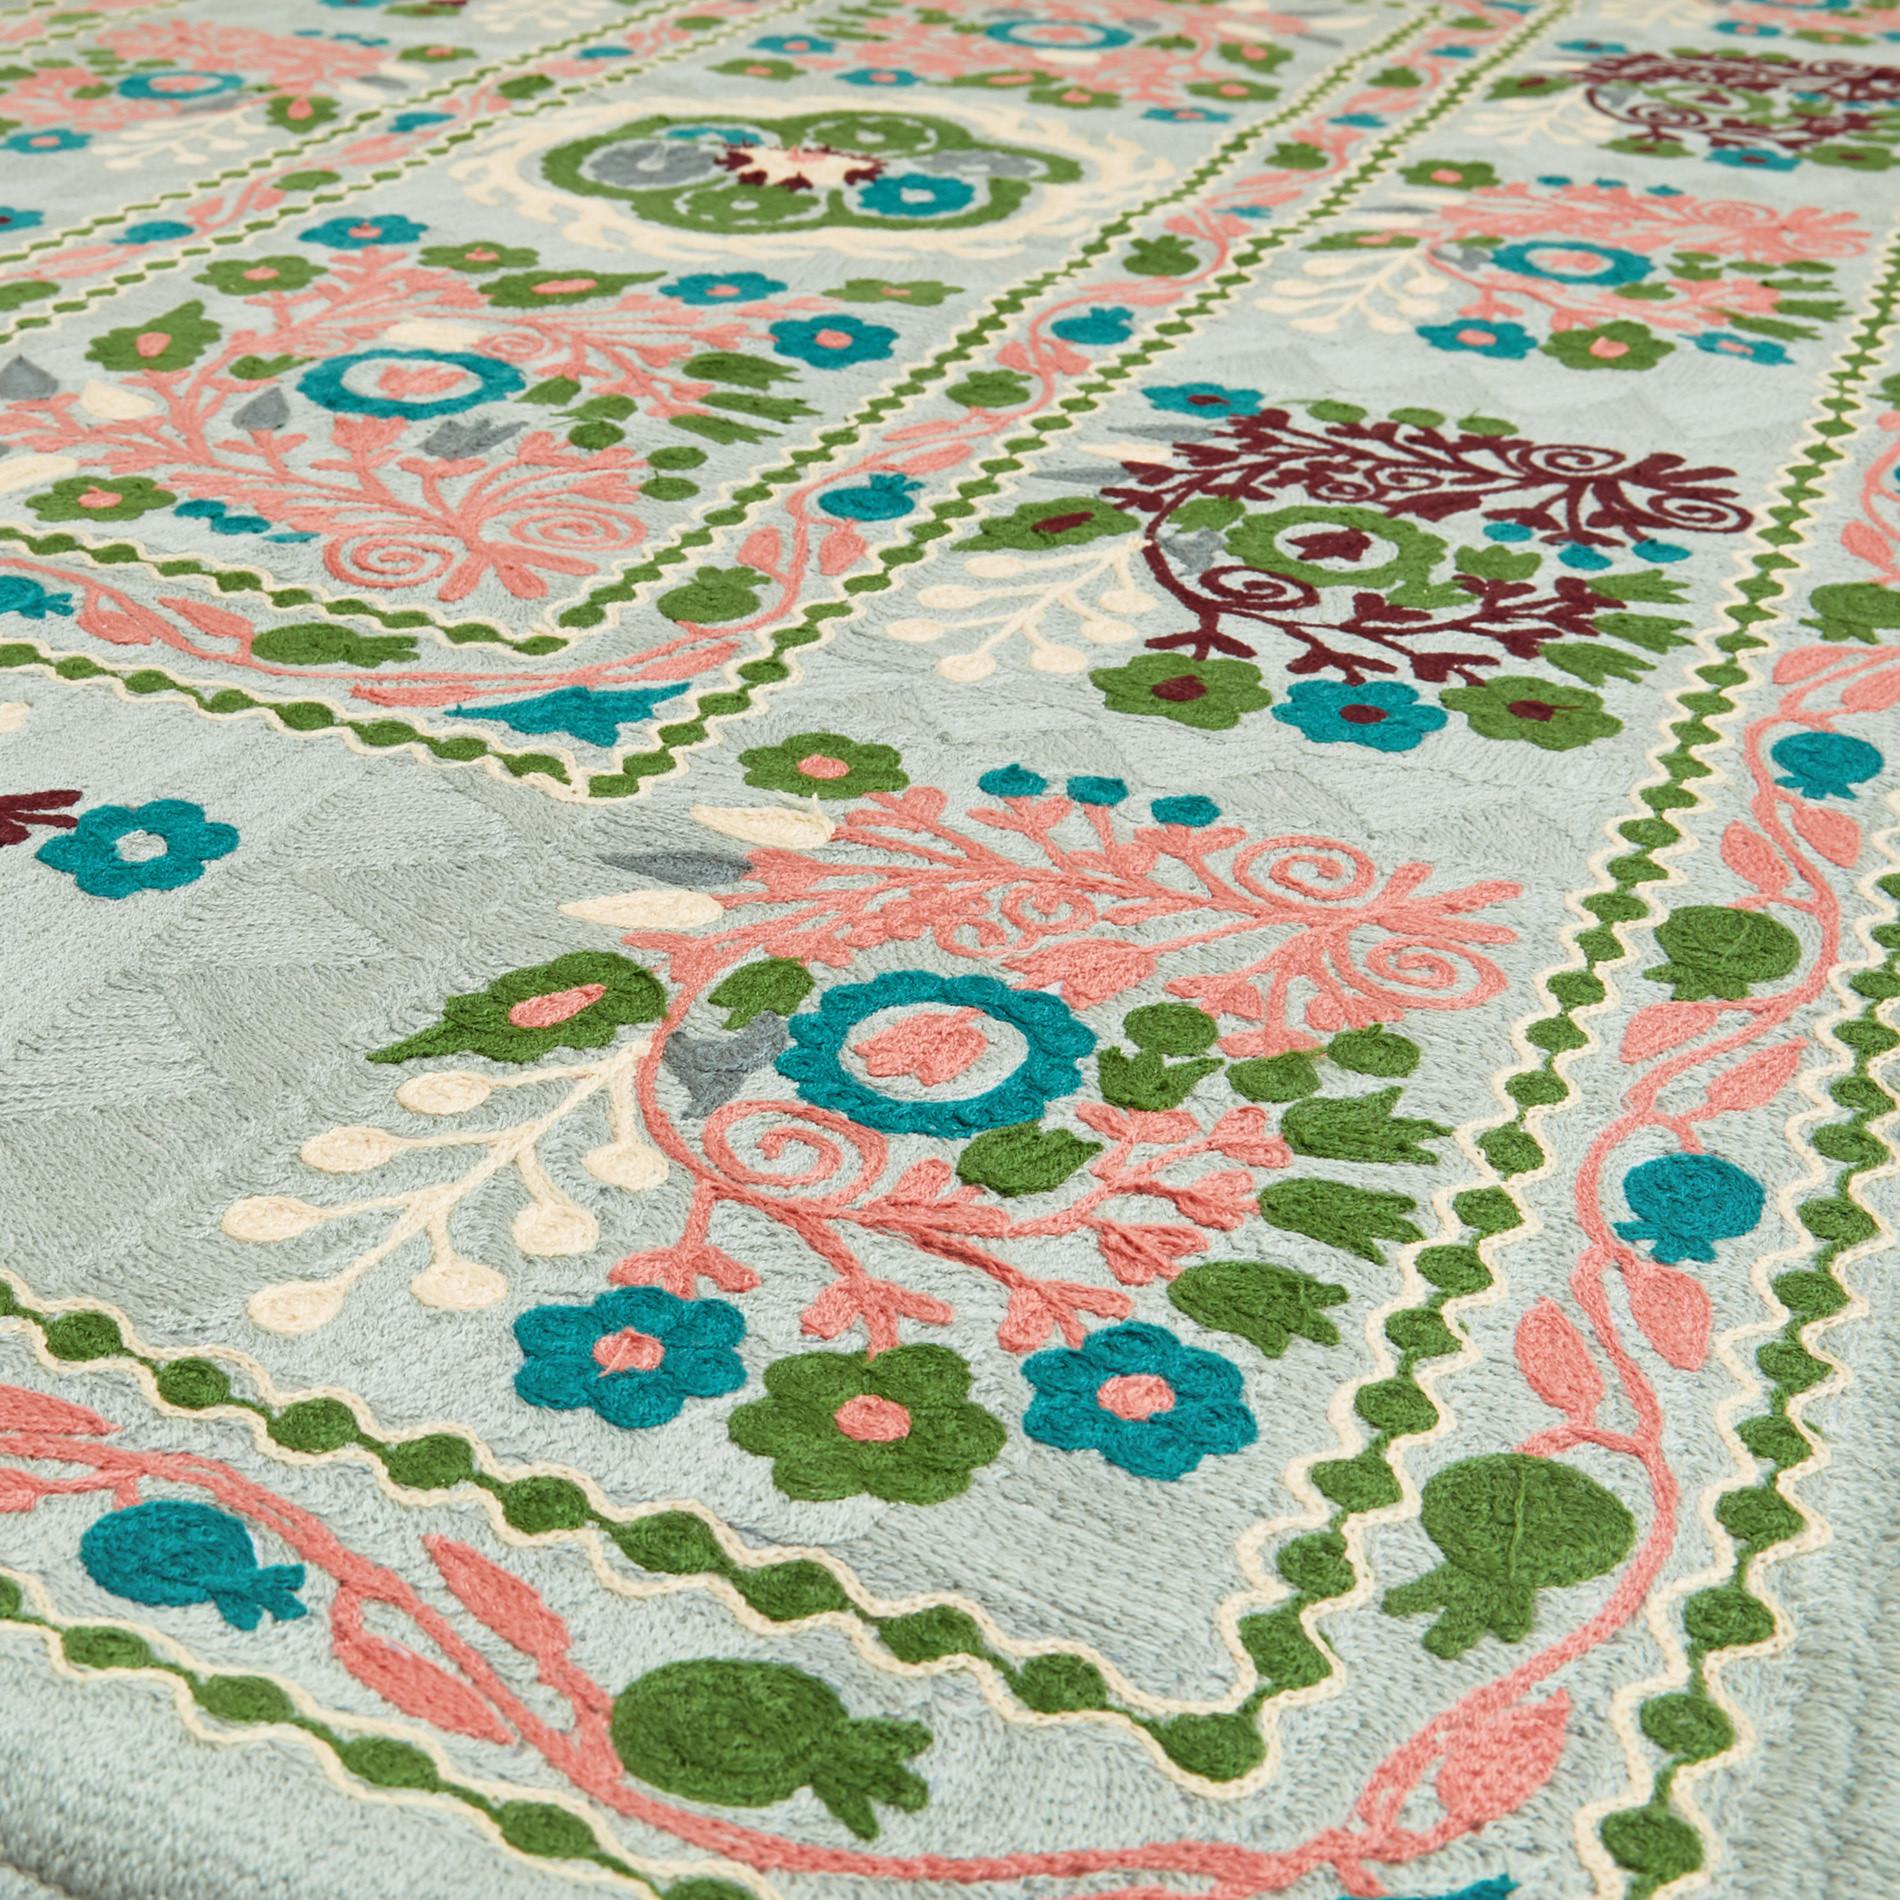 Tappeto puro cotone motivo floreale in lana, Multicolor, large image number 1